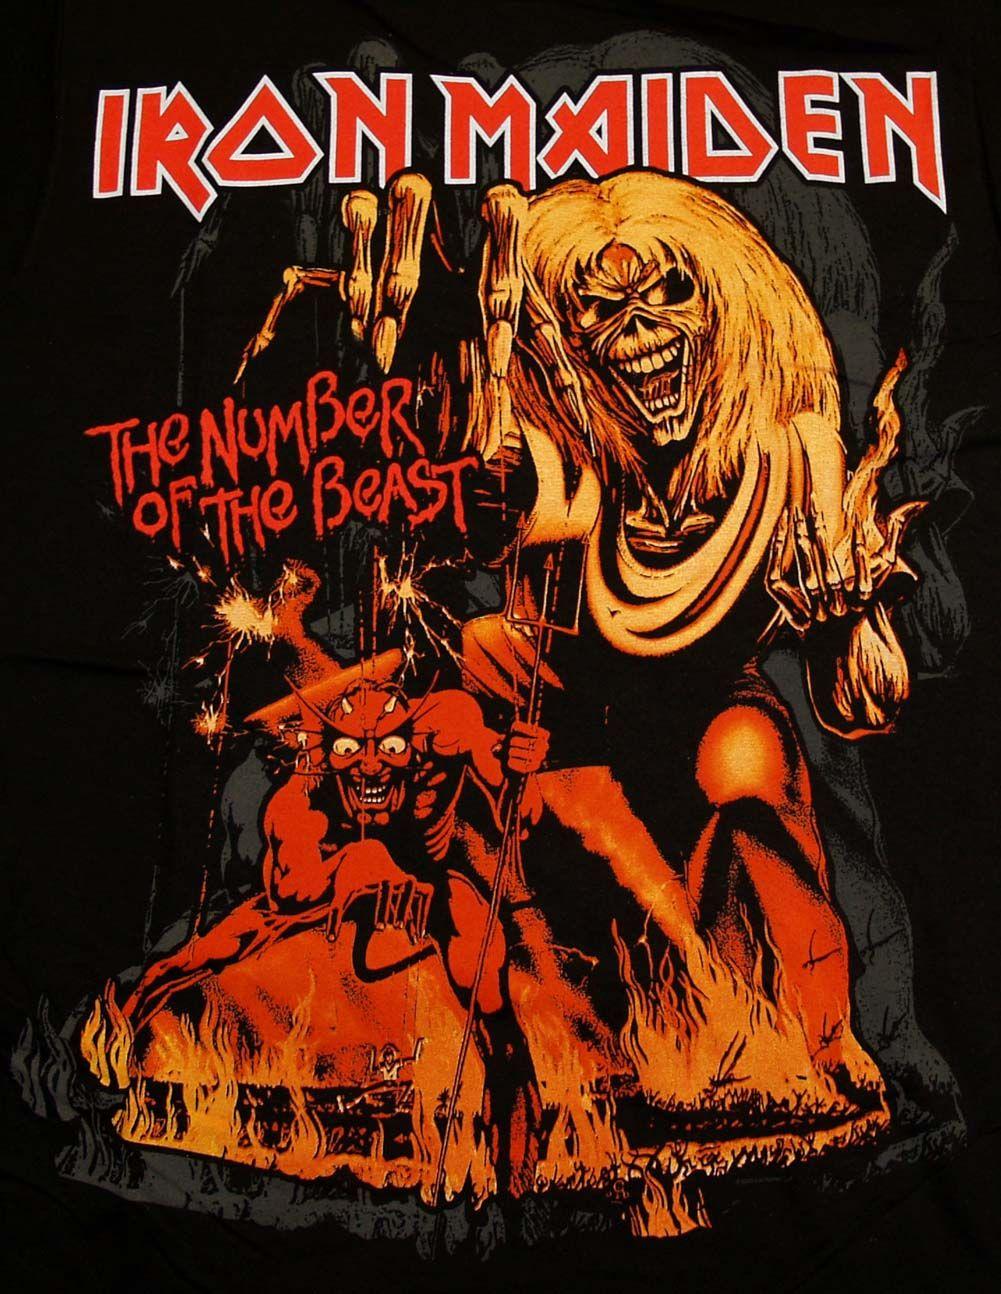 iron maiden shirt rock band